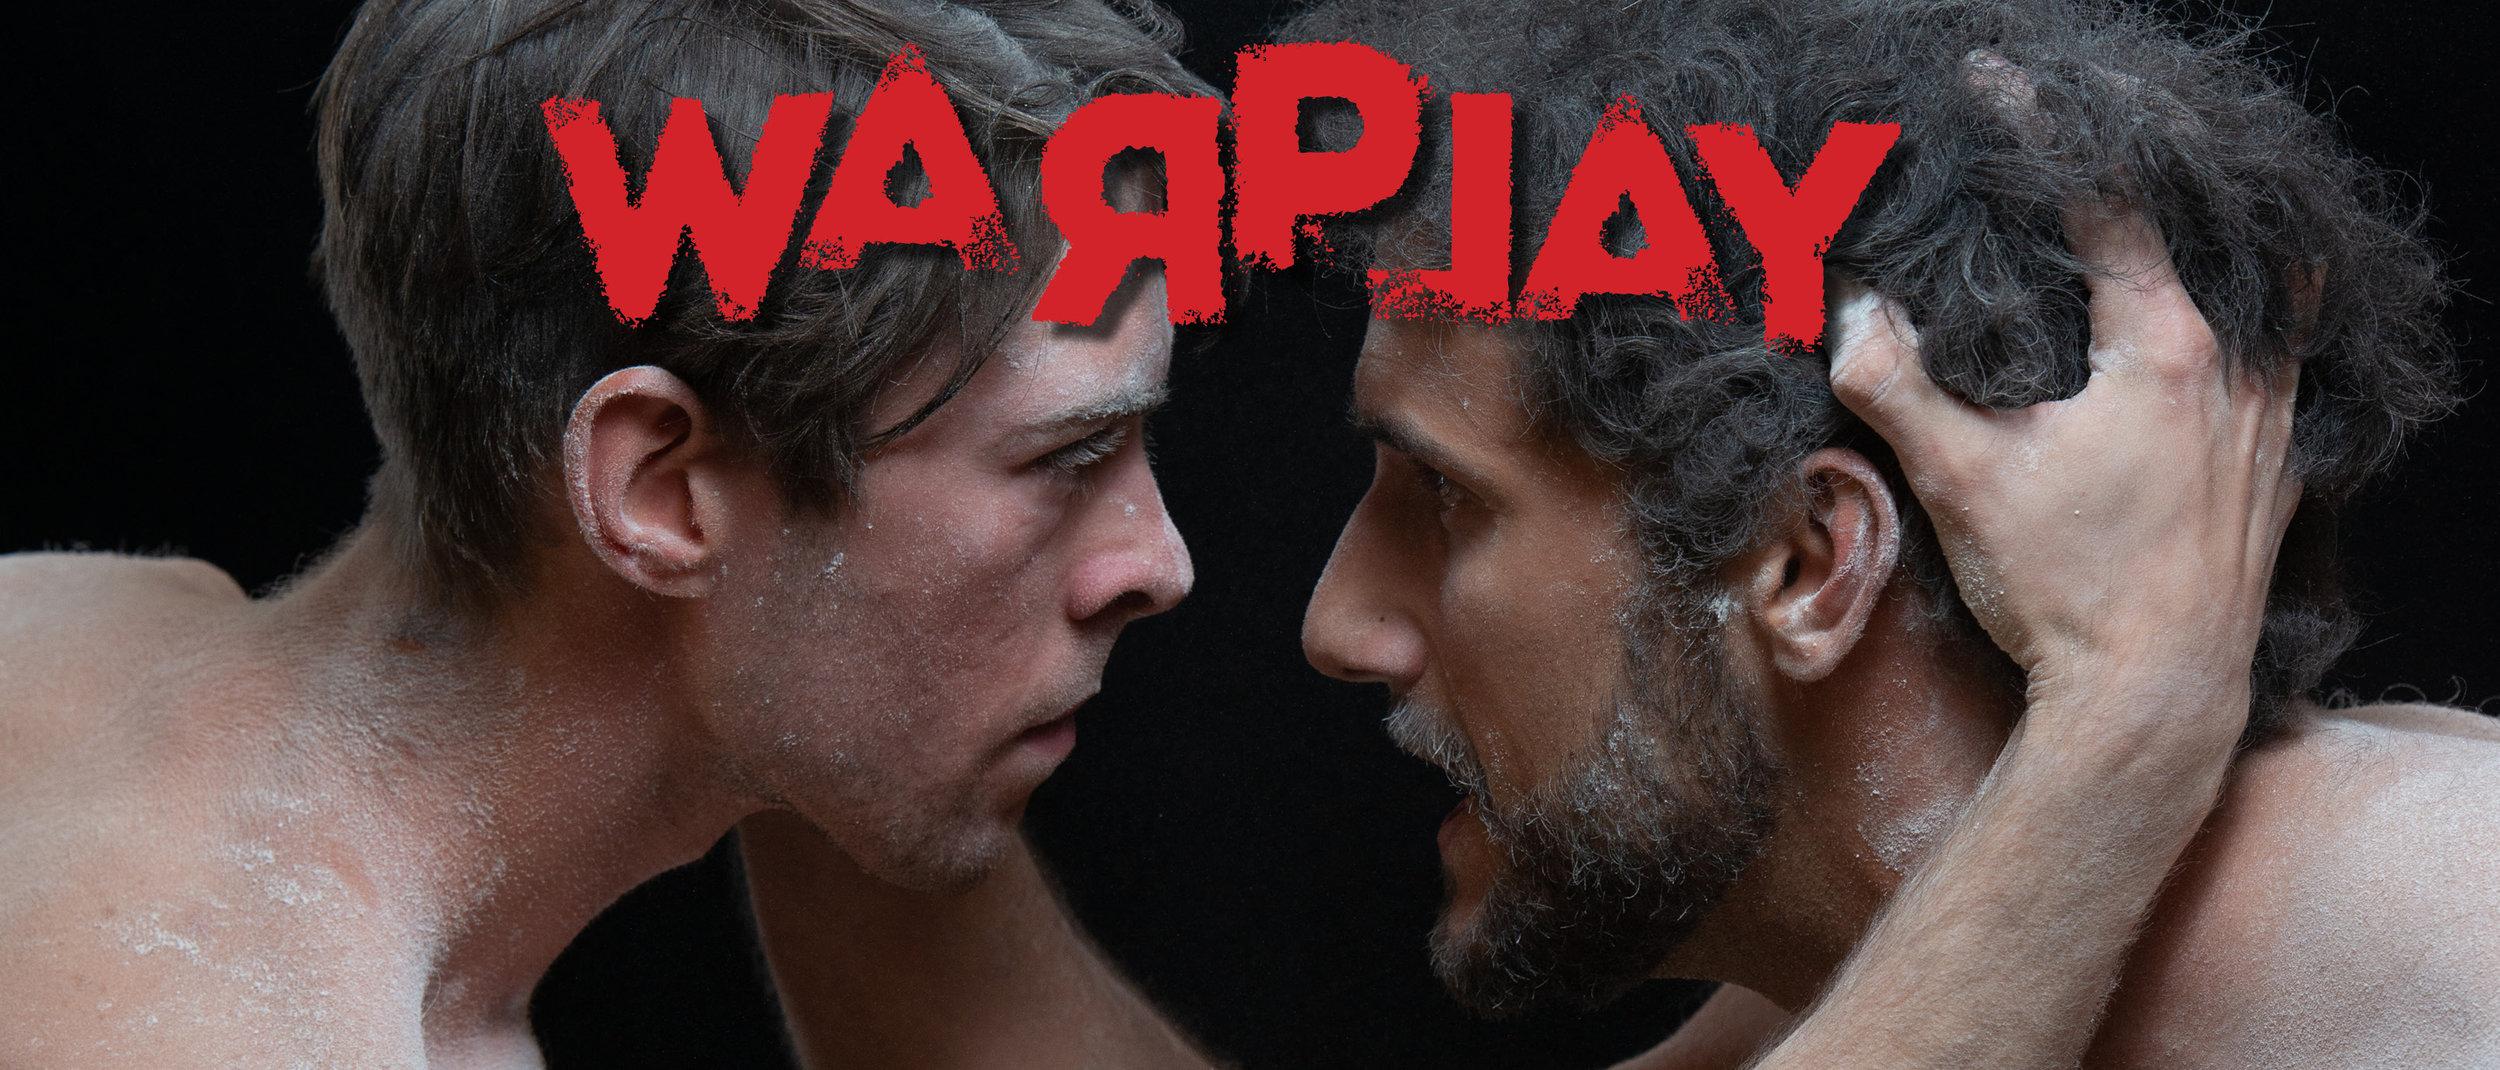 Website_warplay Production Official.jpg